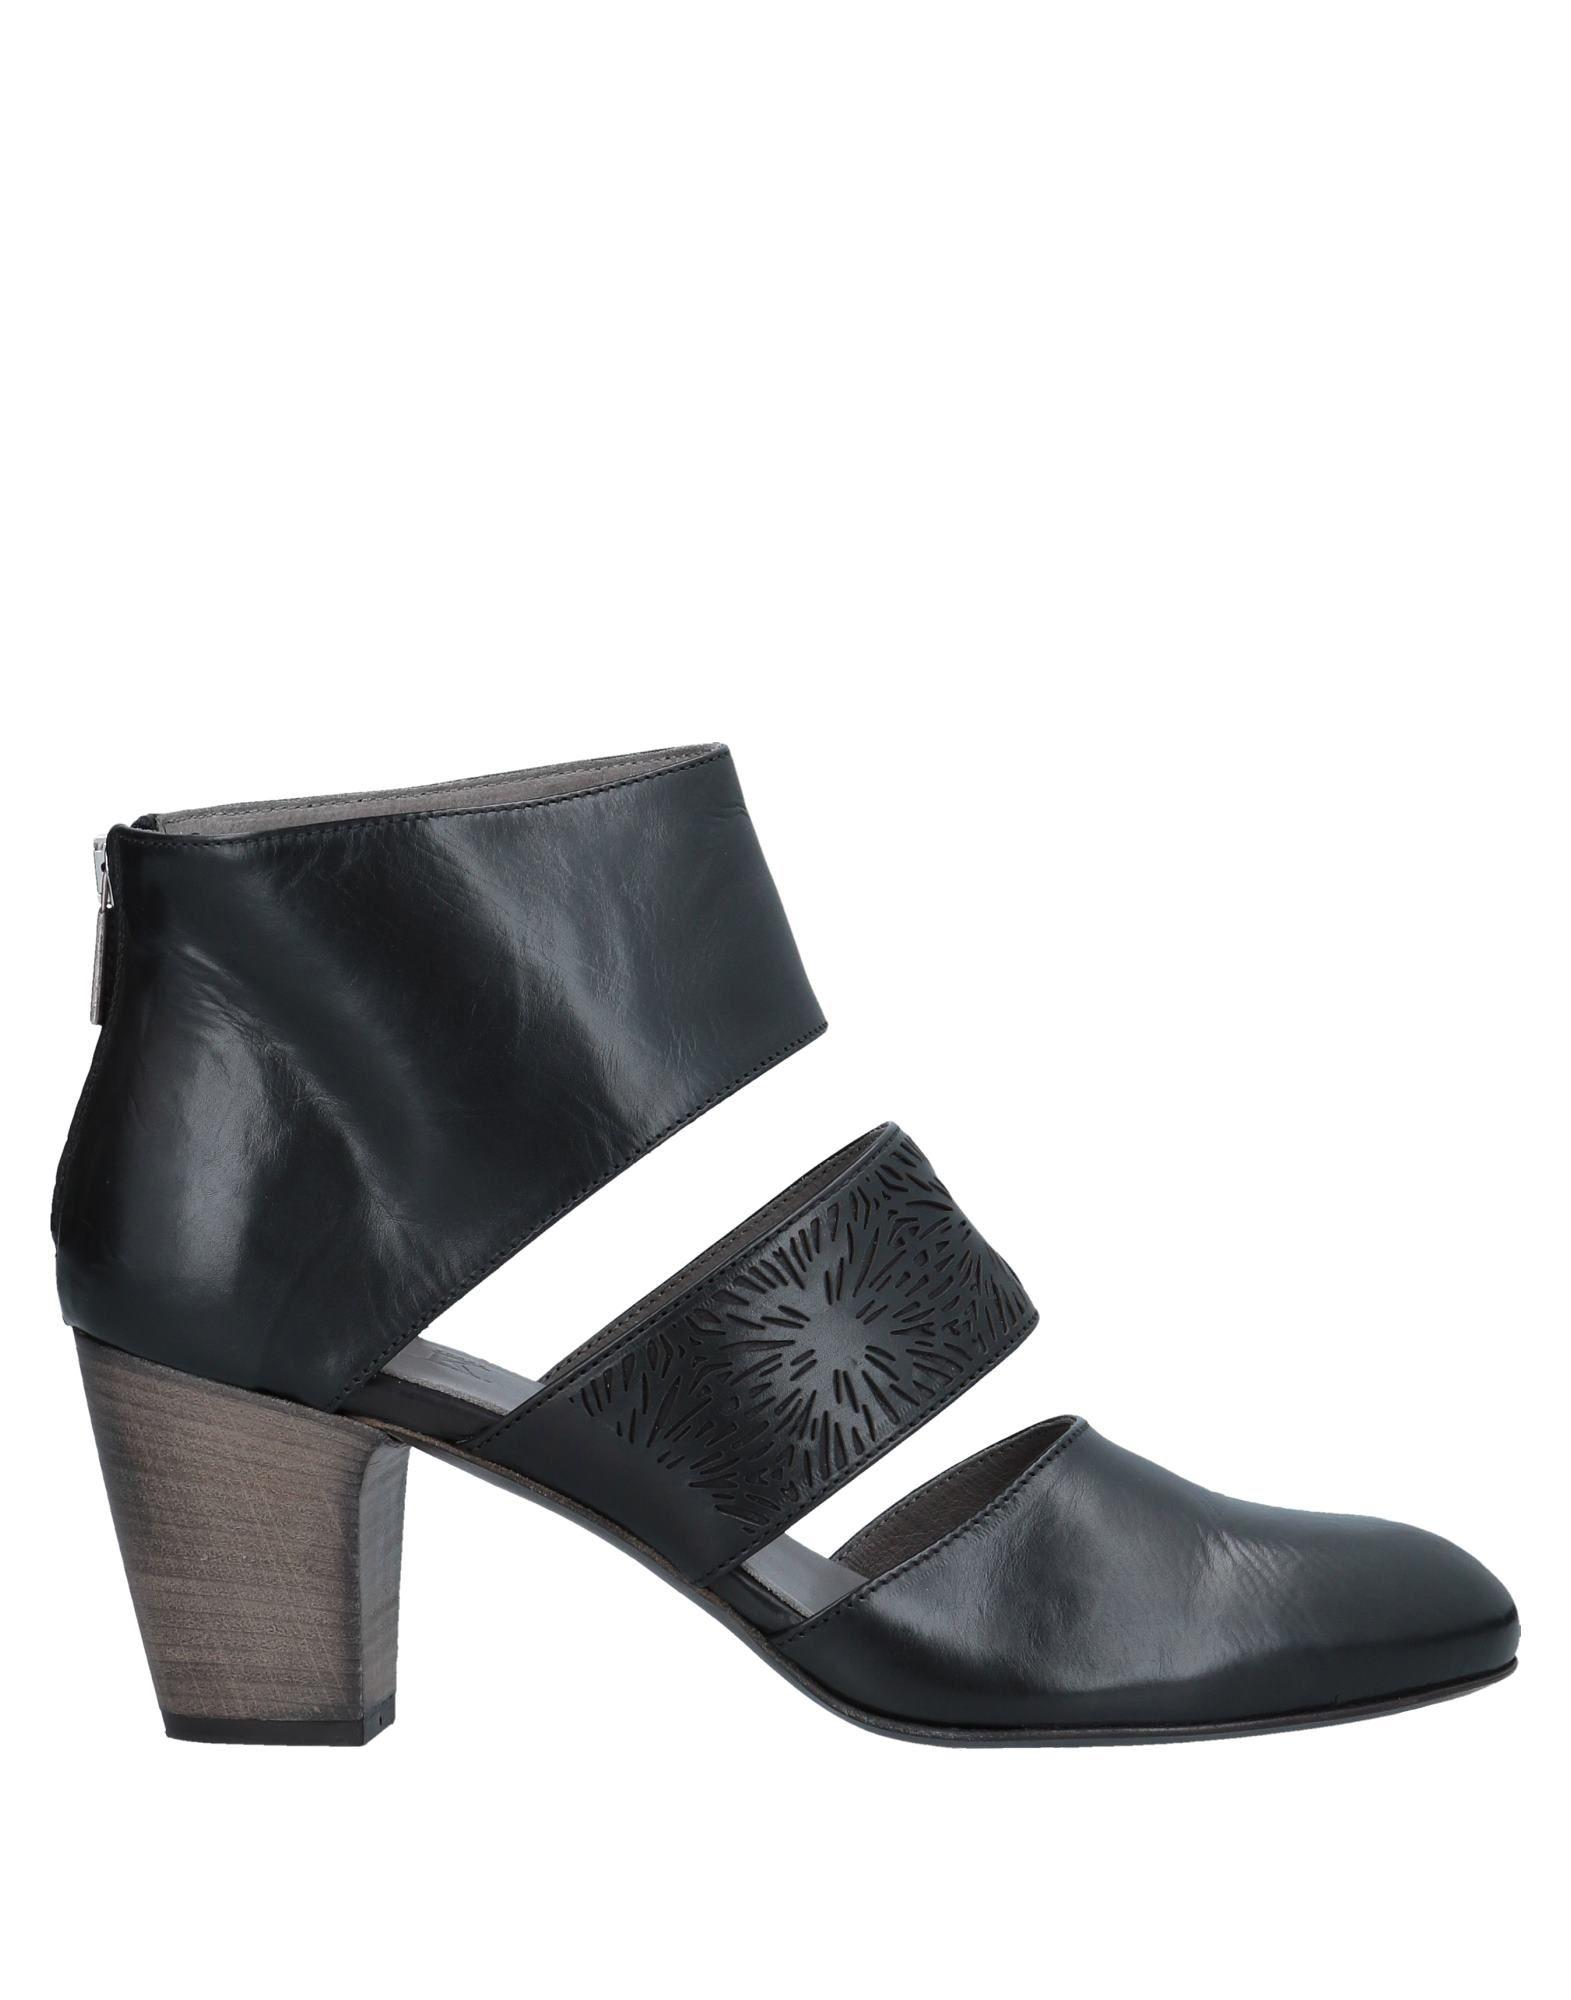 Stivaletti I.N.K. Shoes Donna - 11548240WD